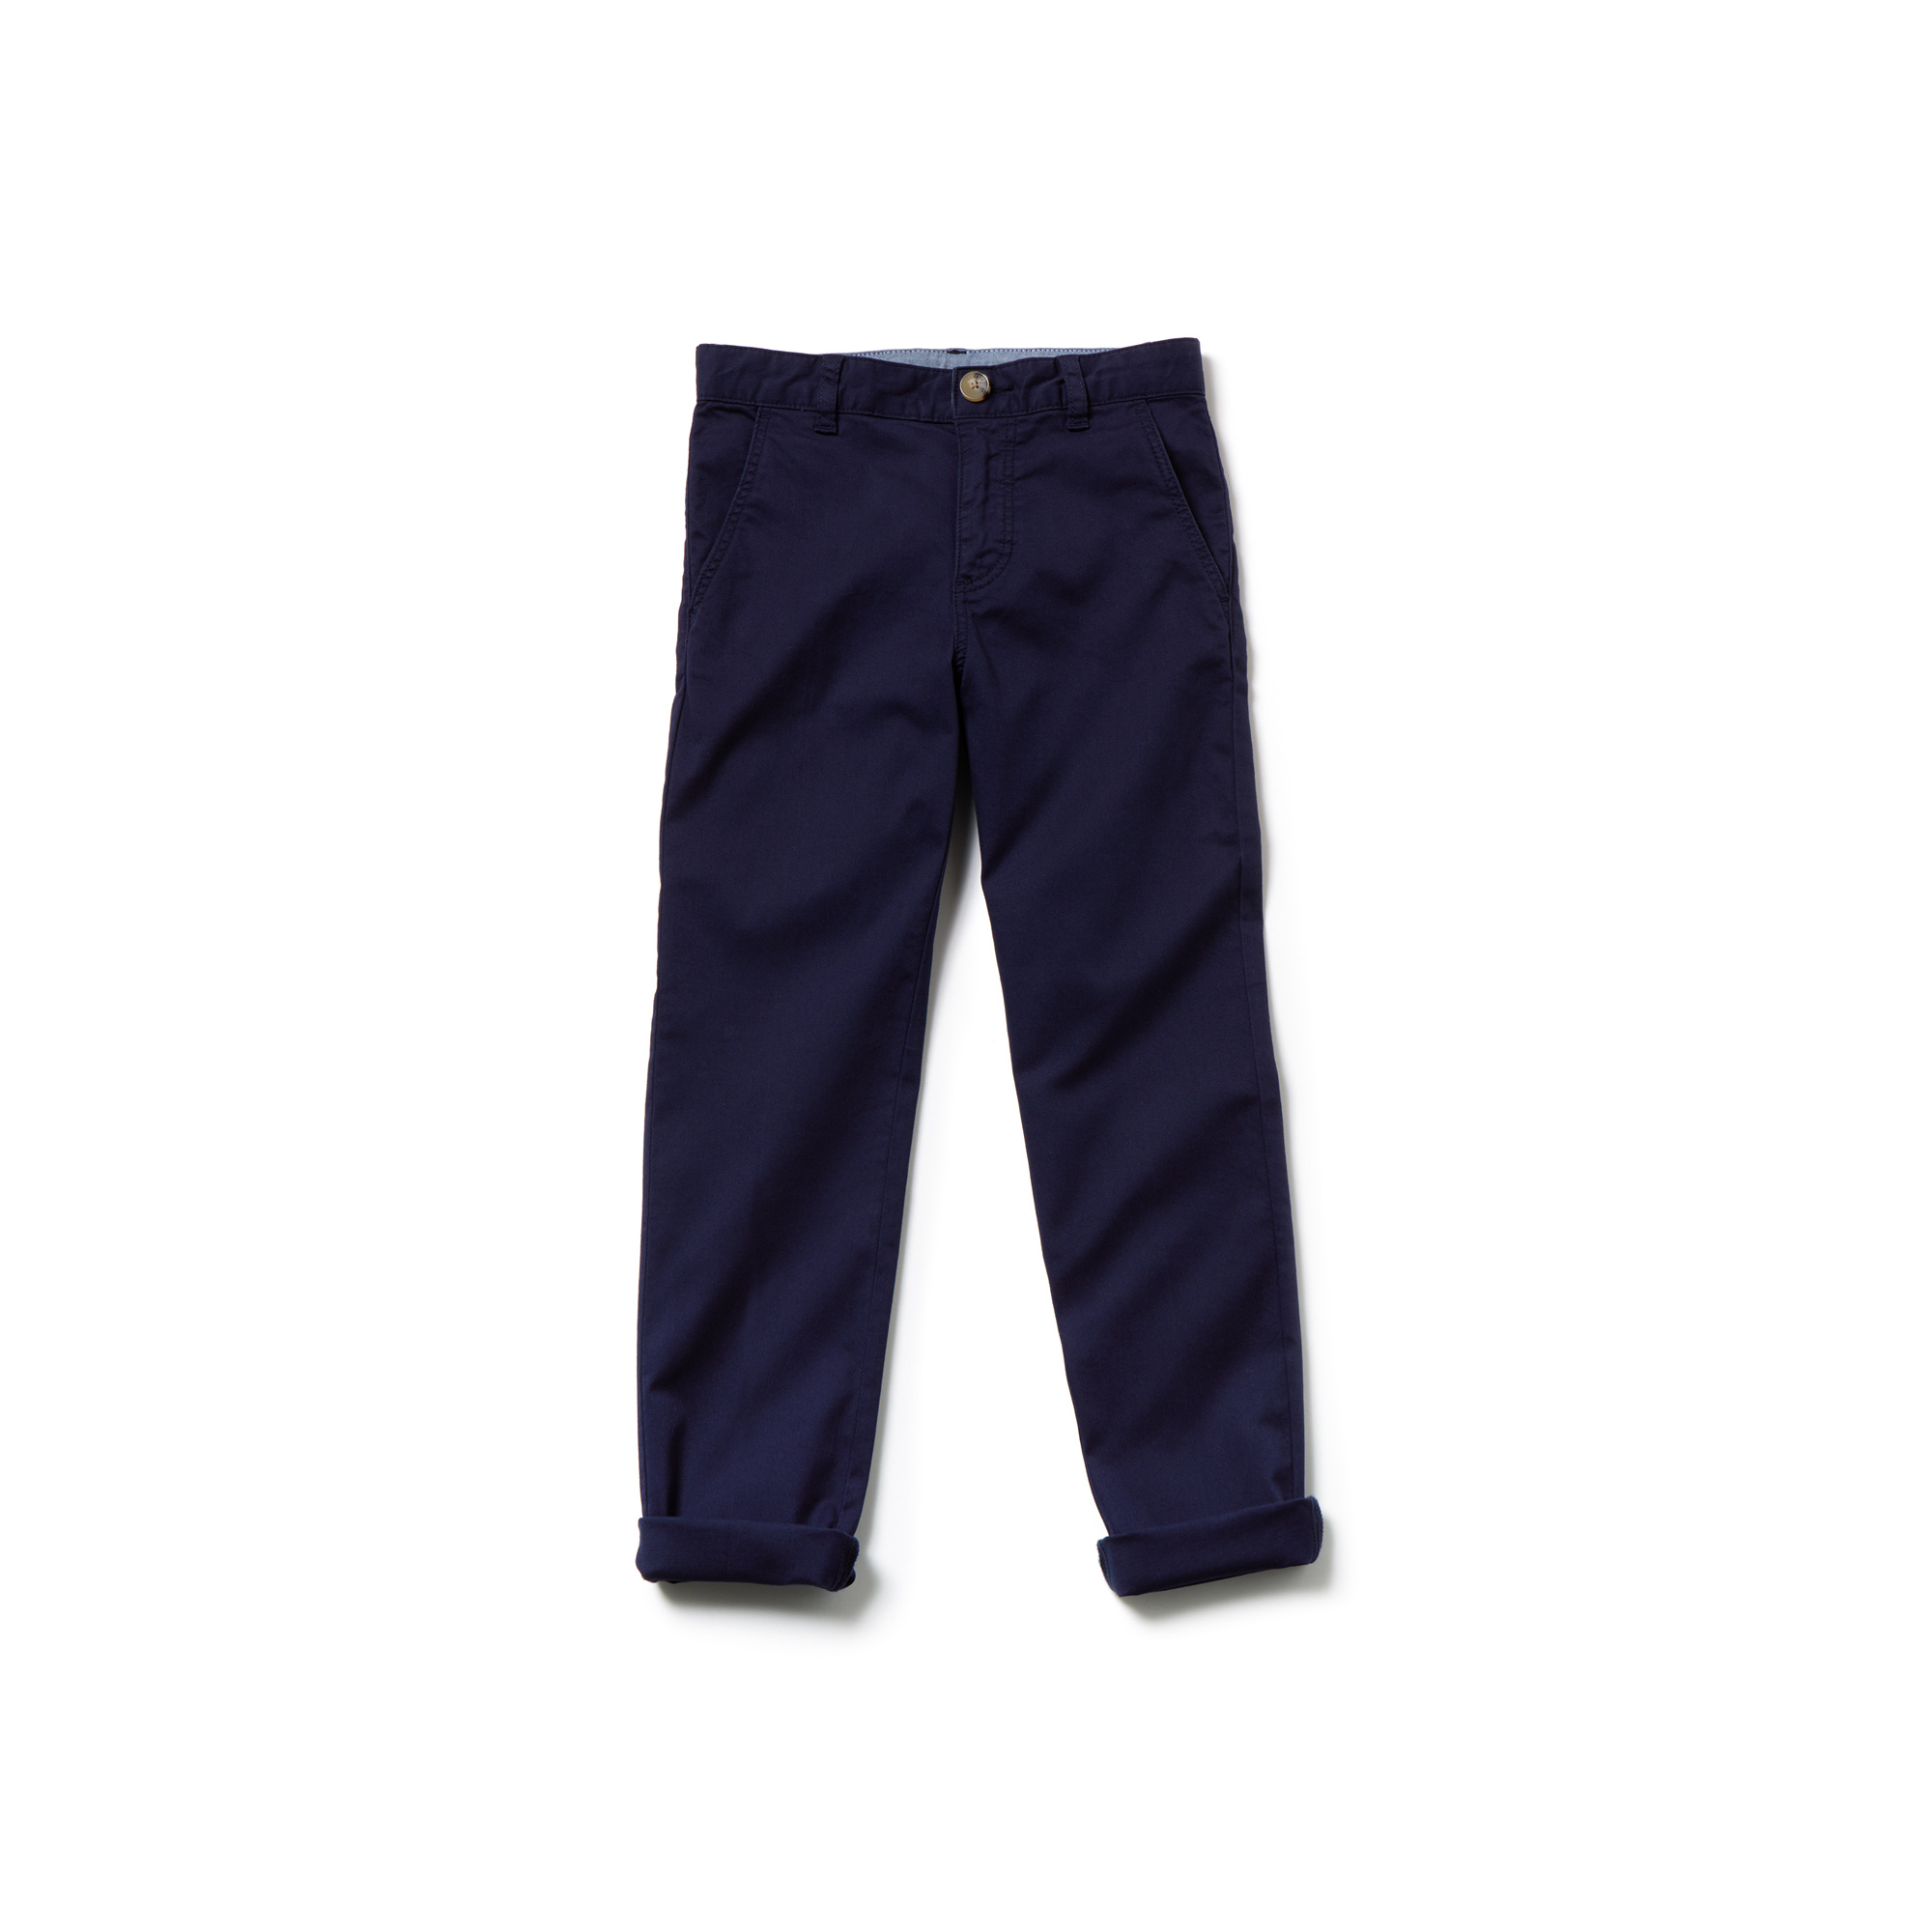 Lacoste штани дитячі